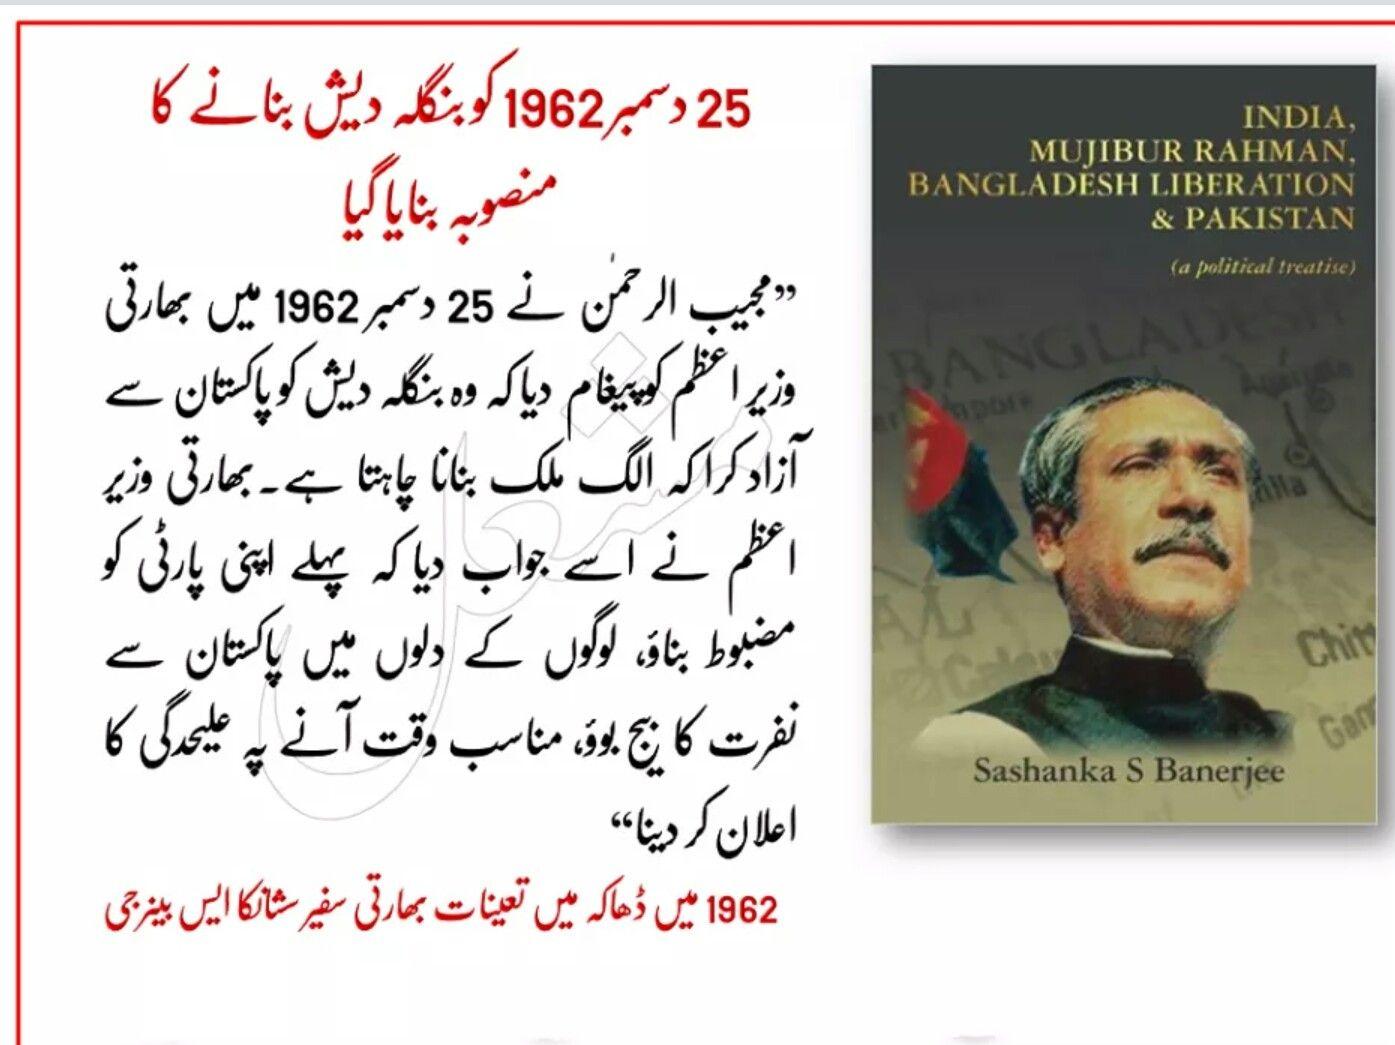 Traitor Mujeeb Ur Rehman And 25 Dec 1962 Flag Country East Pakistan Pakistan